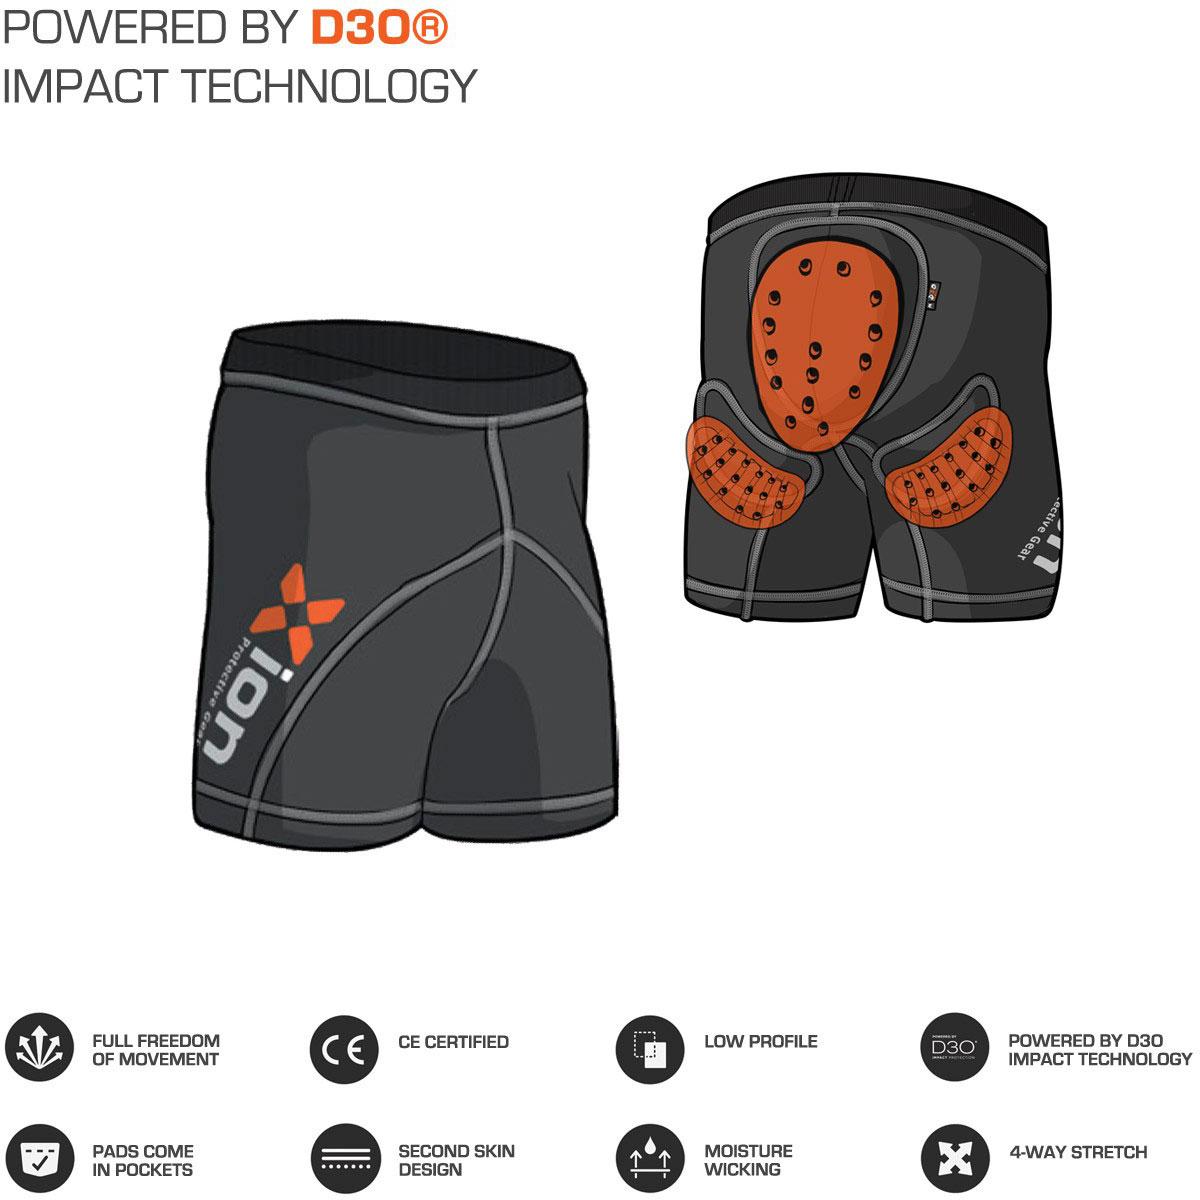 image xion-protective-gear-boxer-short-jpg